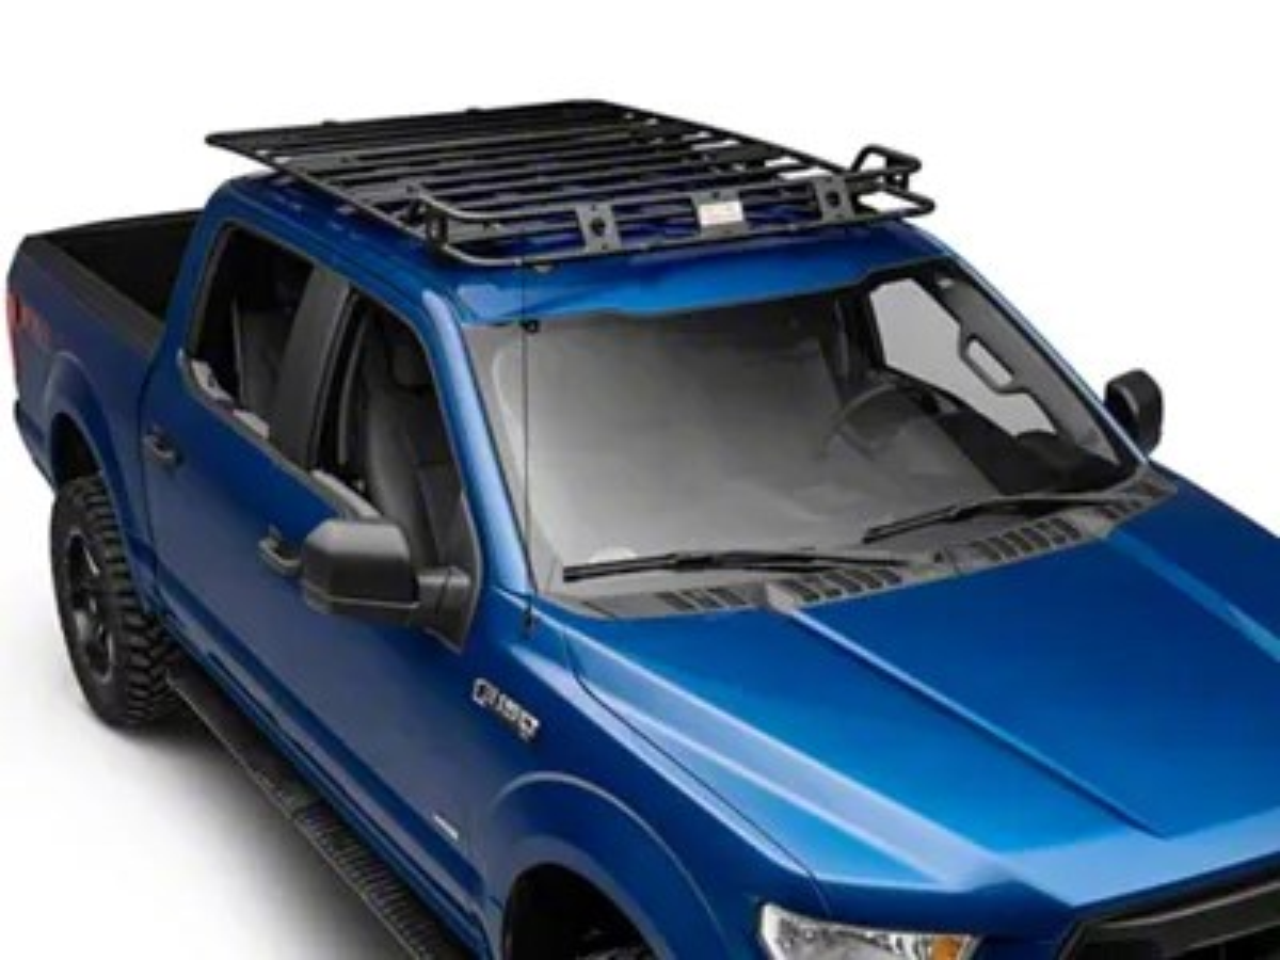 smittybilt defender roof rack 4 50 foot x 5 foot universal fitment